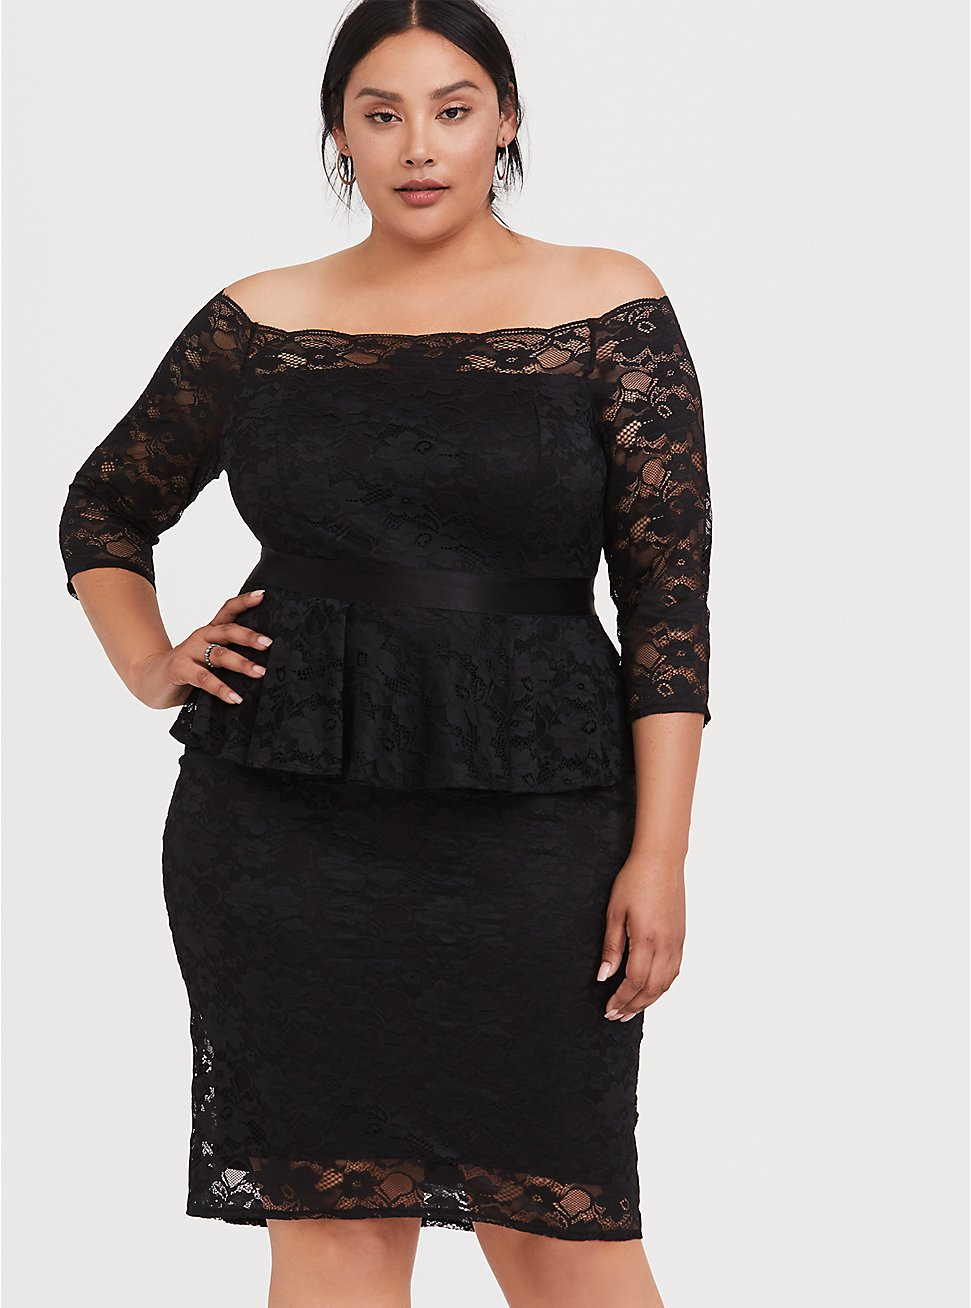 Special Occasion Black Lace Off Shoulder Peplum Shift Dress, DEEP BLACK, hi-res